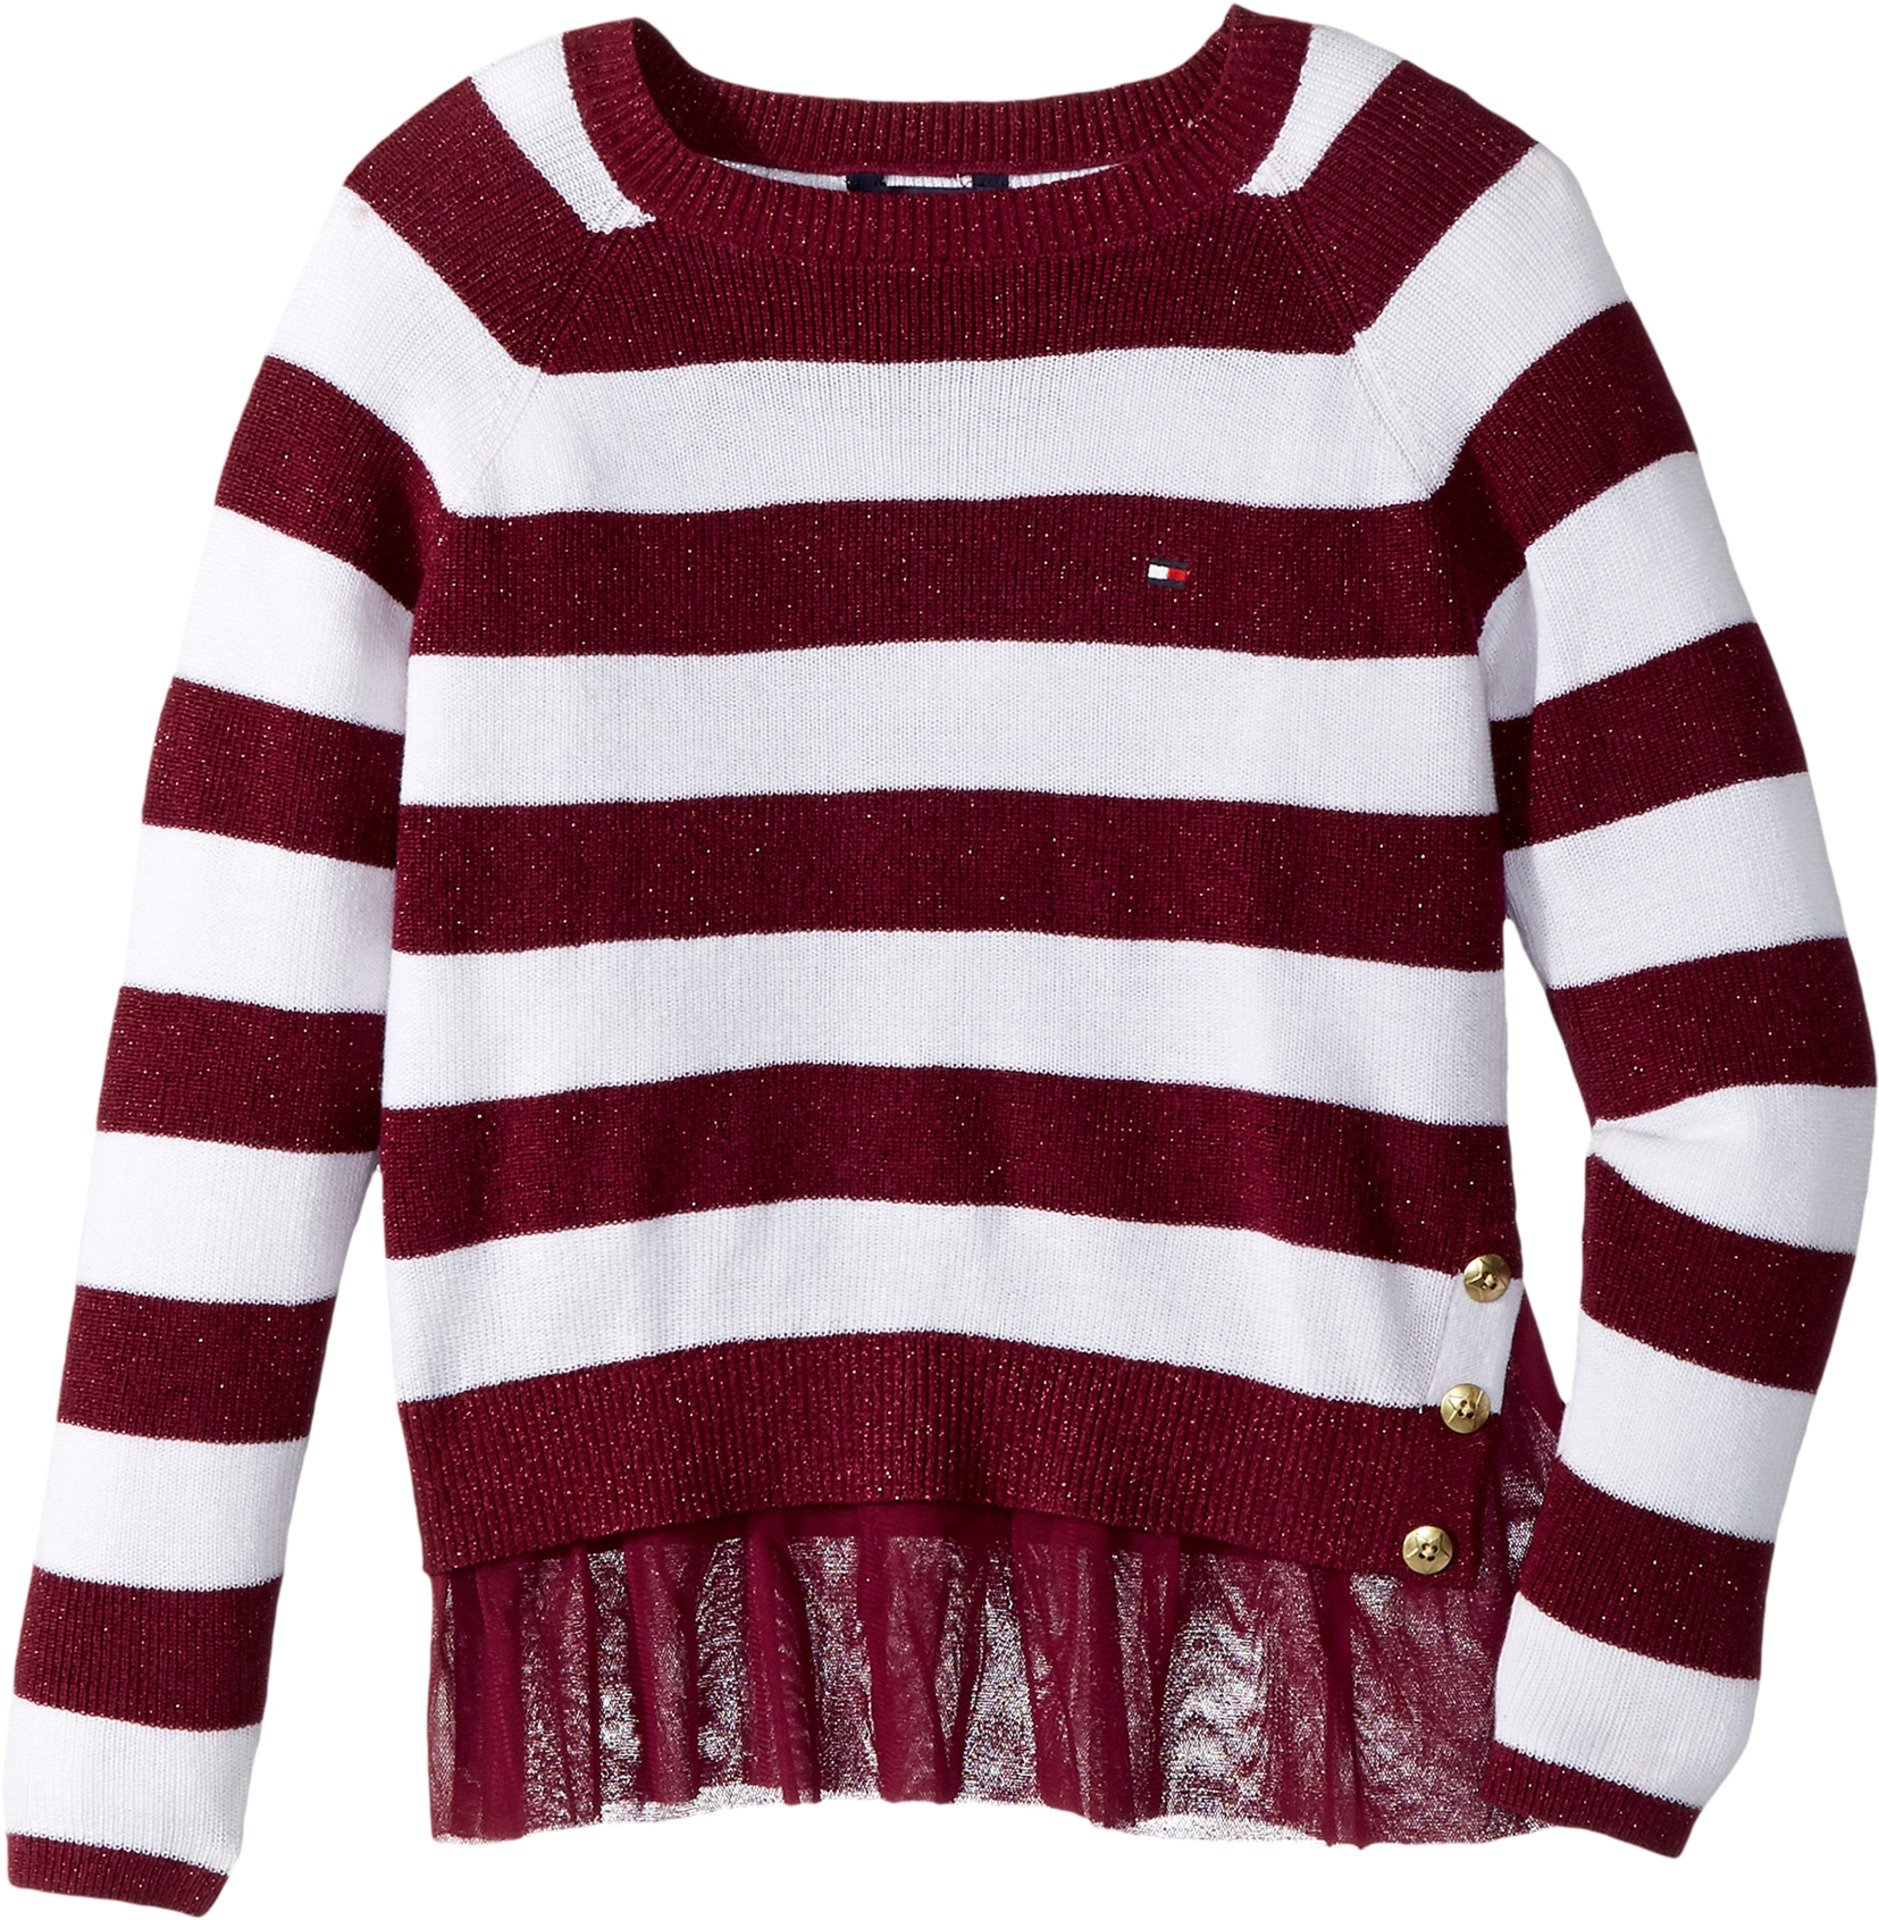 Tommy Hilfiger Big Girls' Pullover Fashion Sweater, Cranberry Jewel, Large